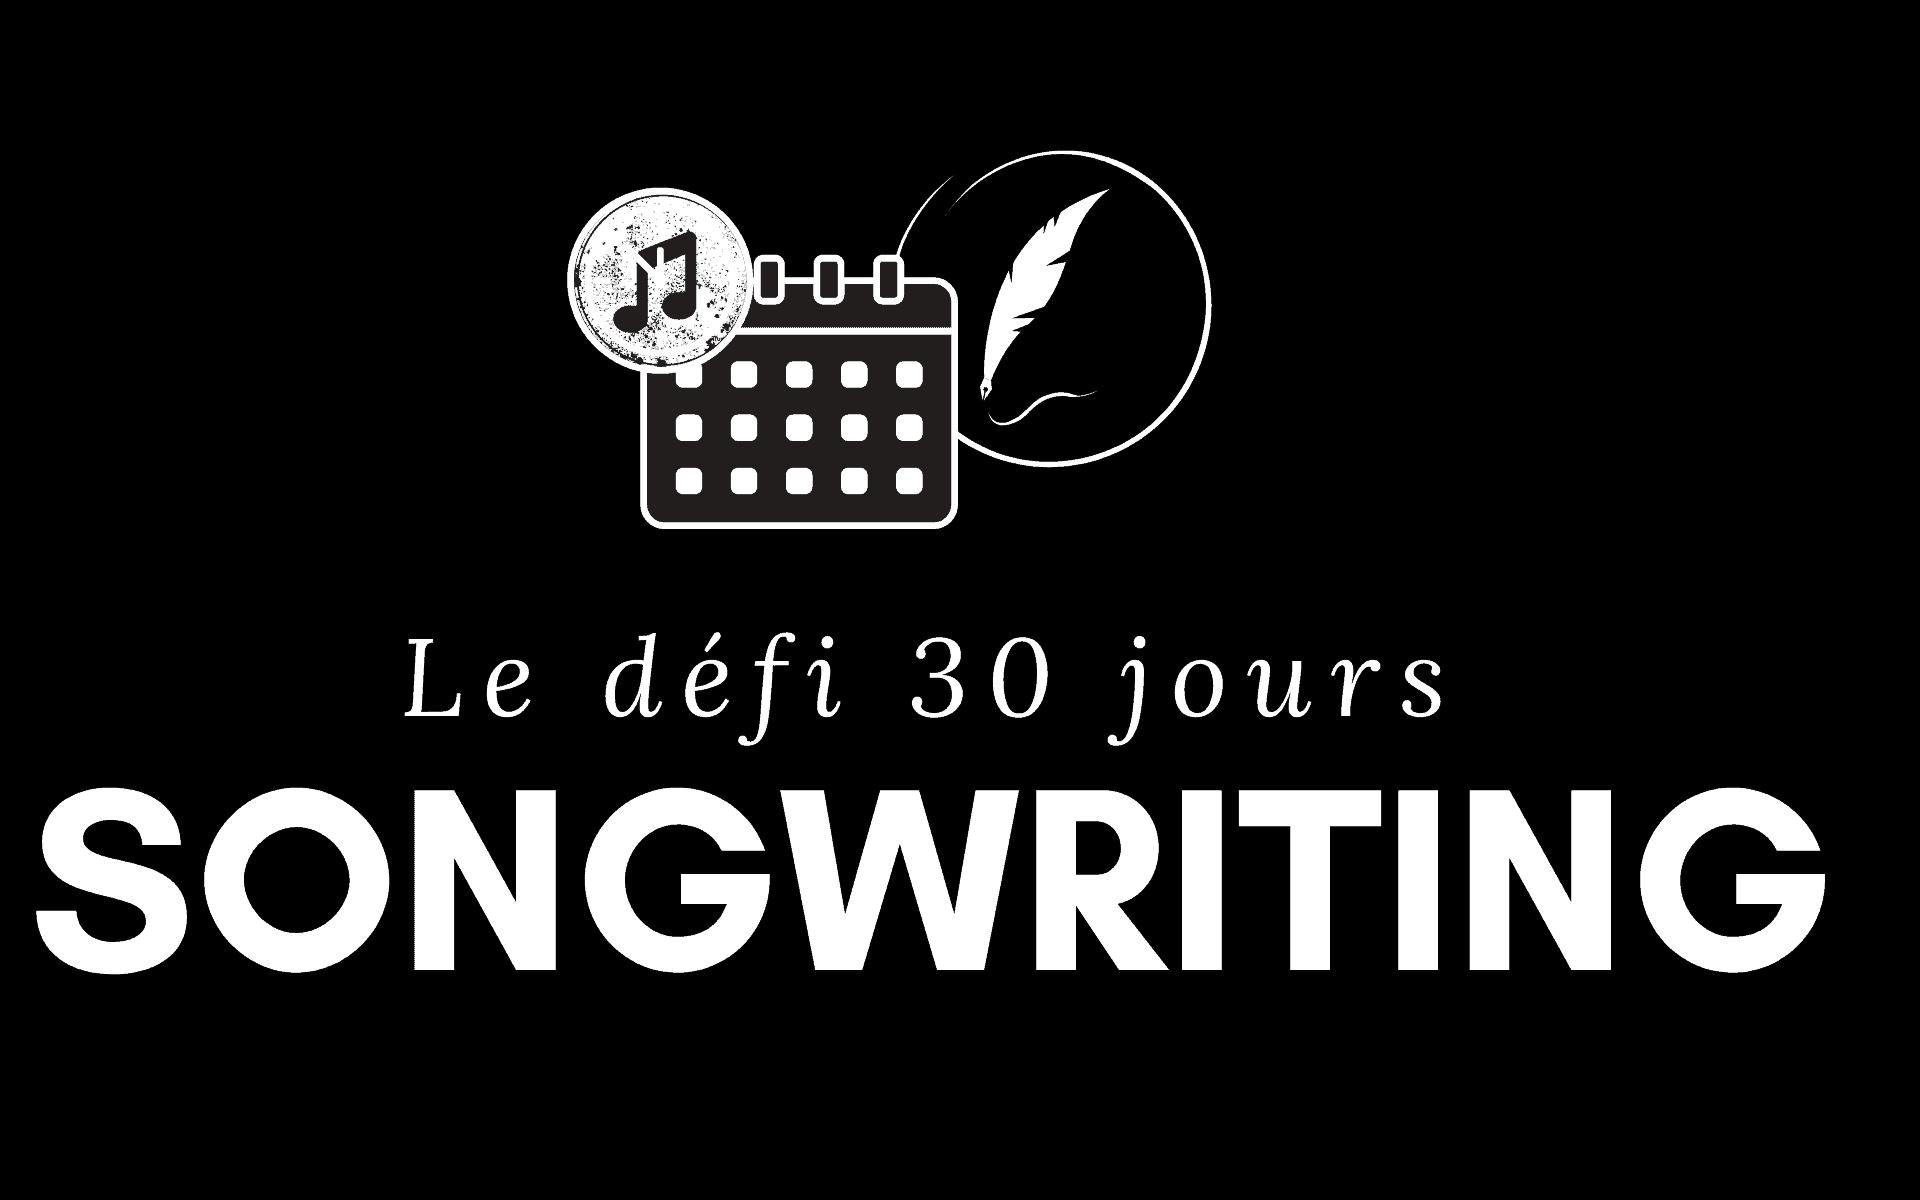 defi songwriting